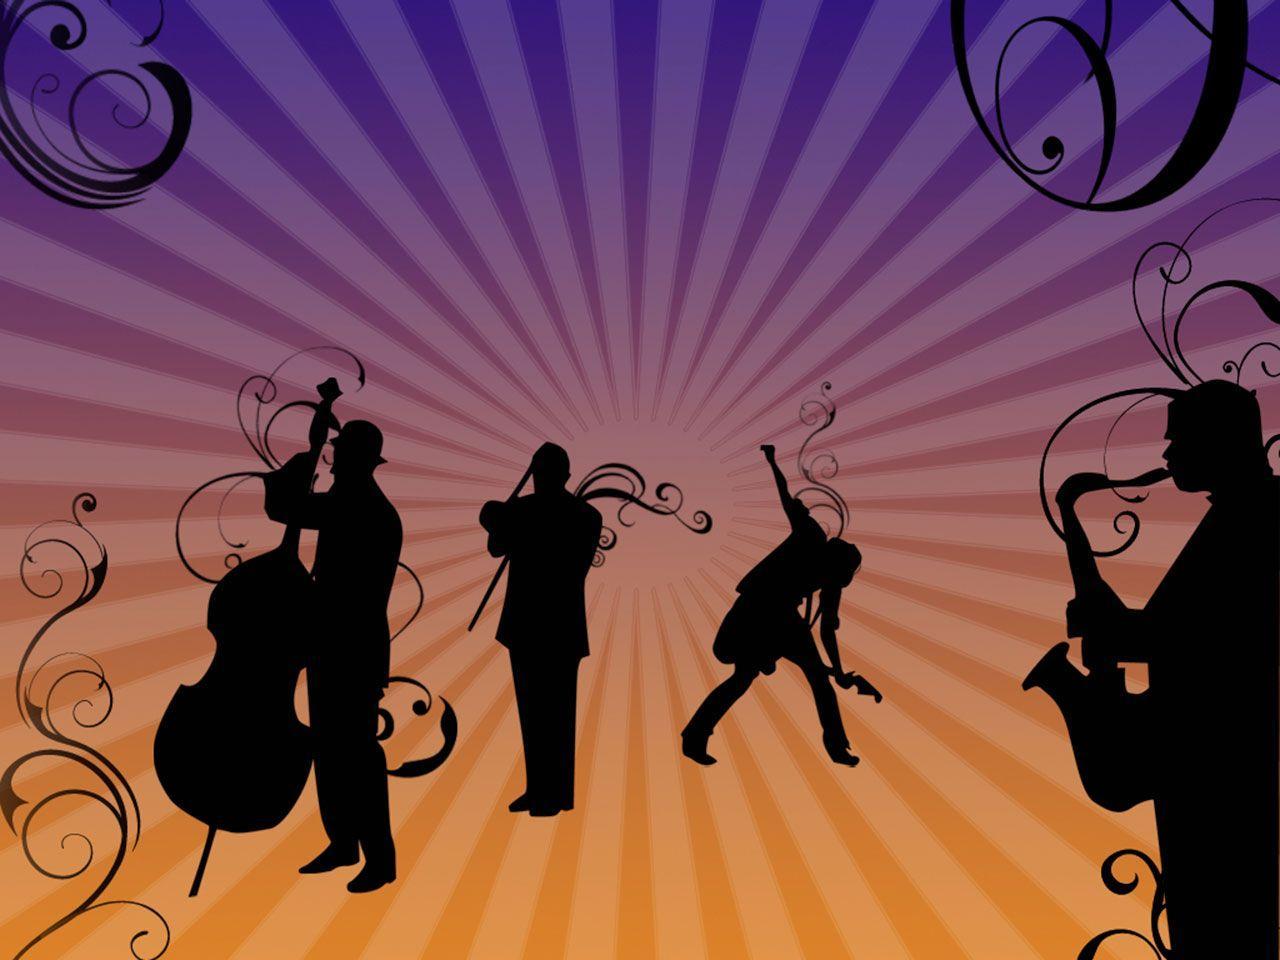 Free Wallpapers - The Spirit Of Jazz wallpaper